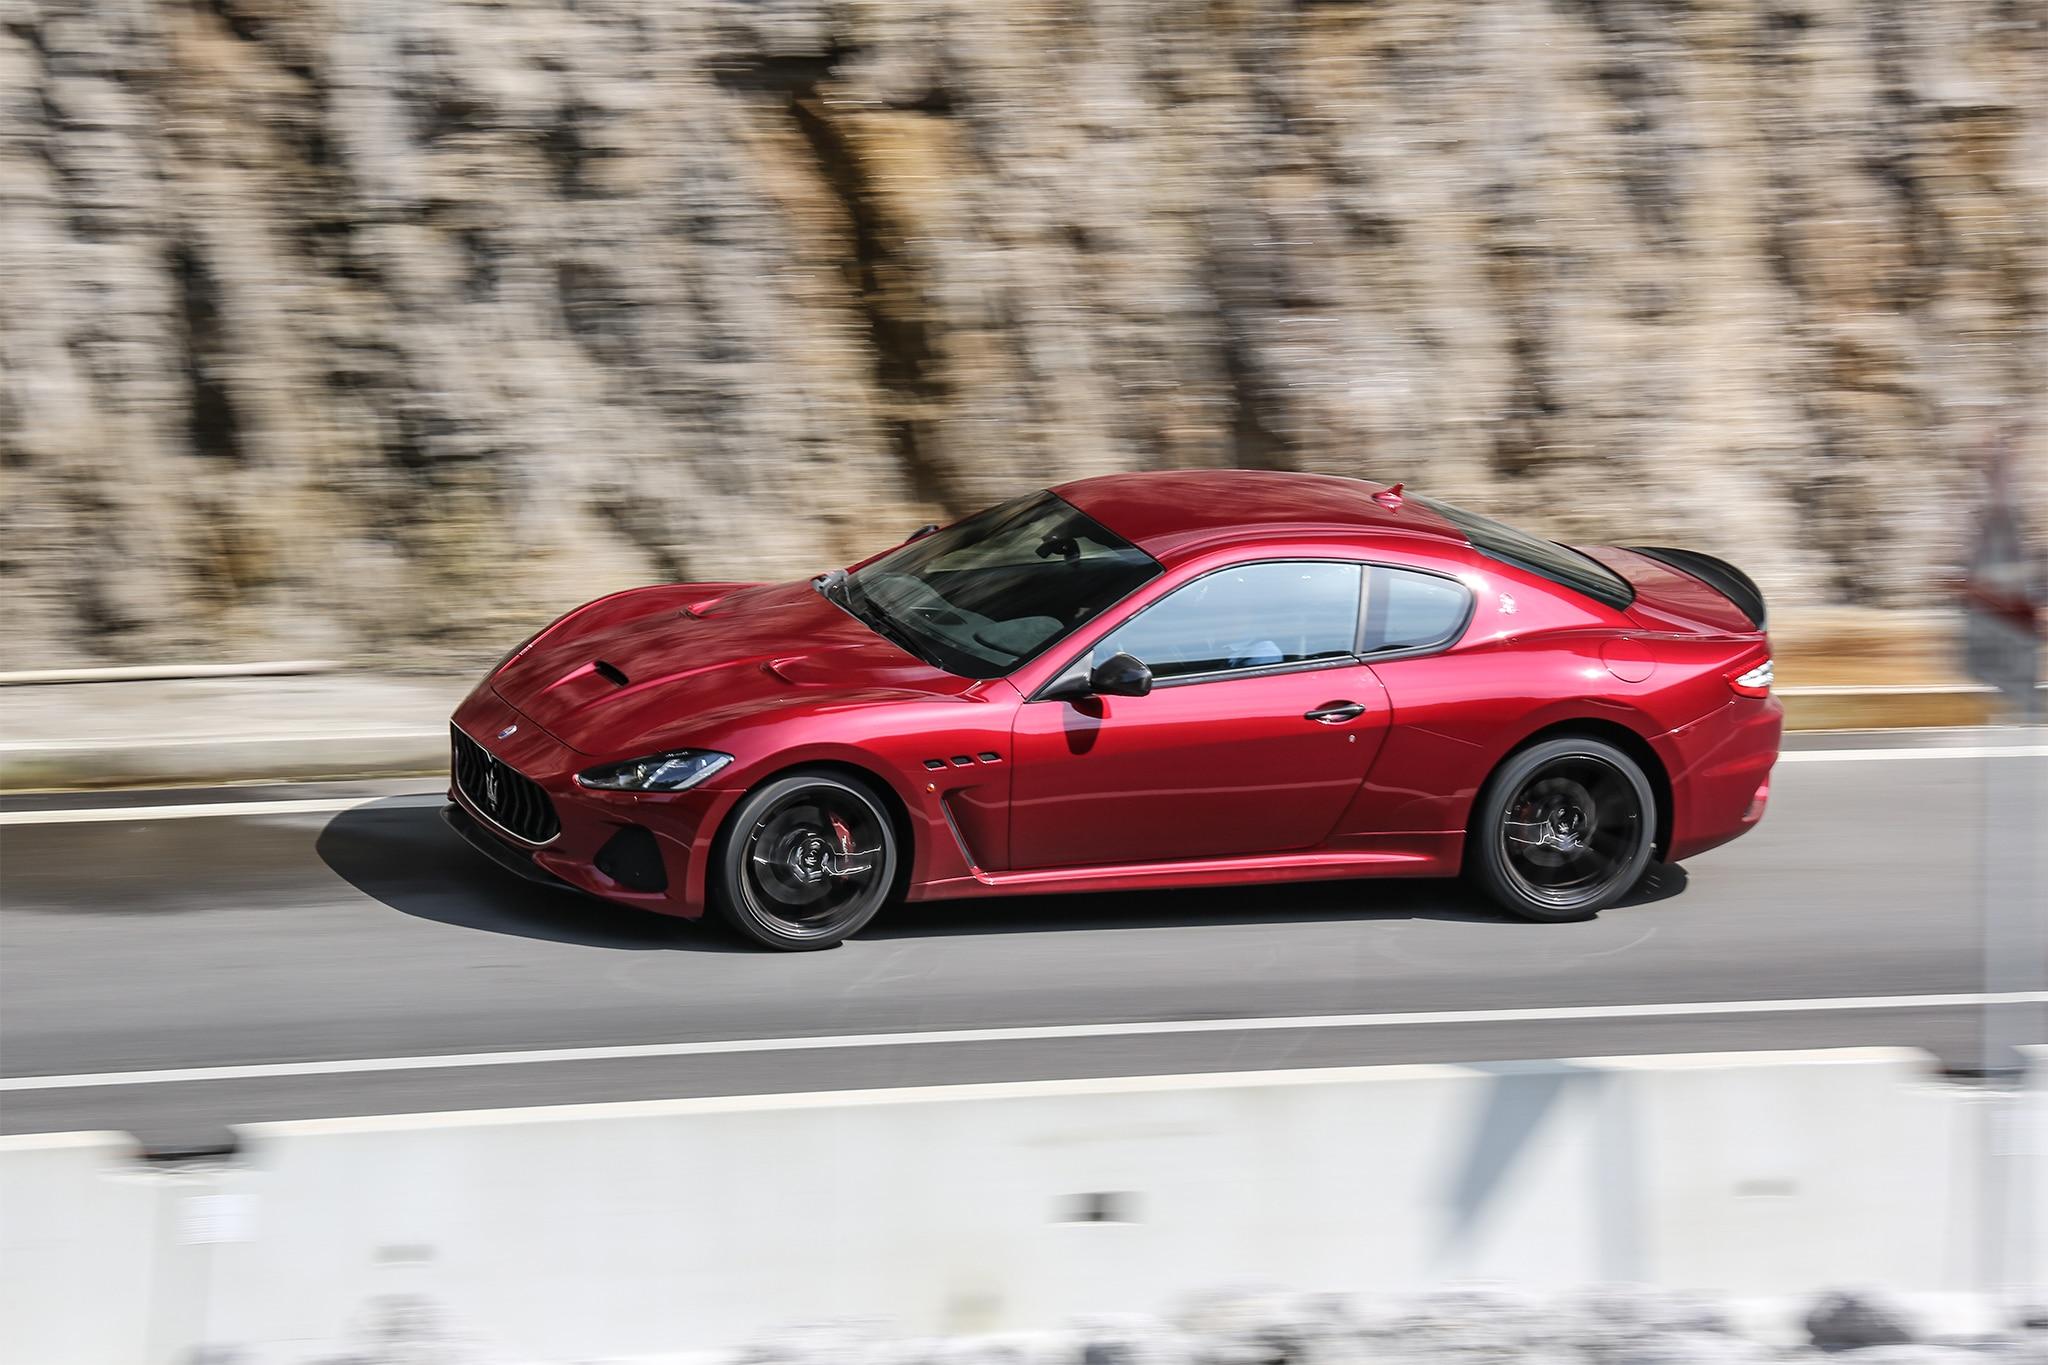 http://st.automobilemag.com/uploads/sites/11/2017/07/2018-Maserati-GranTurismo-side-profile-in-motion-02.jpg